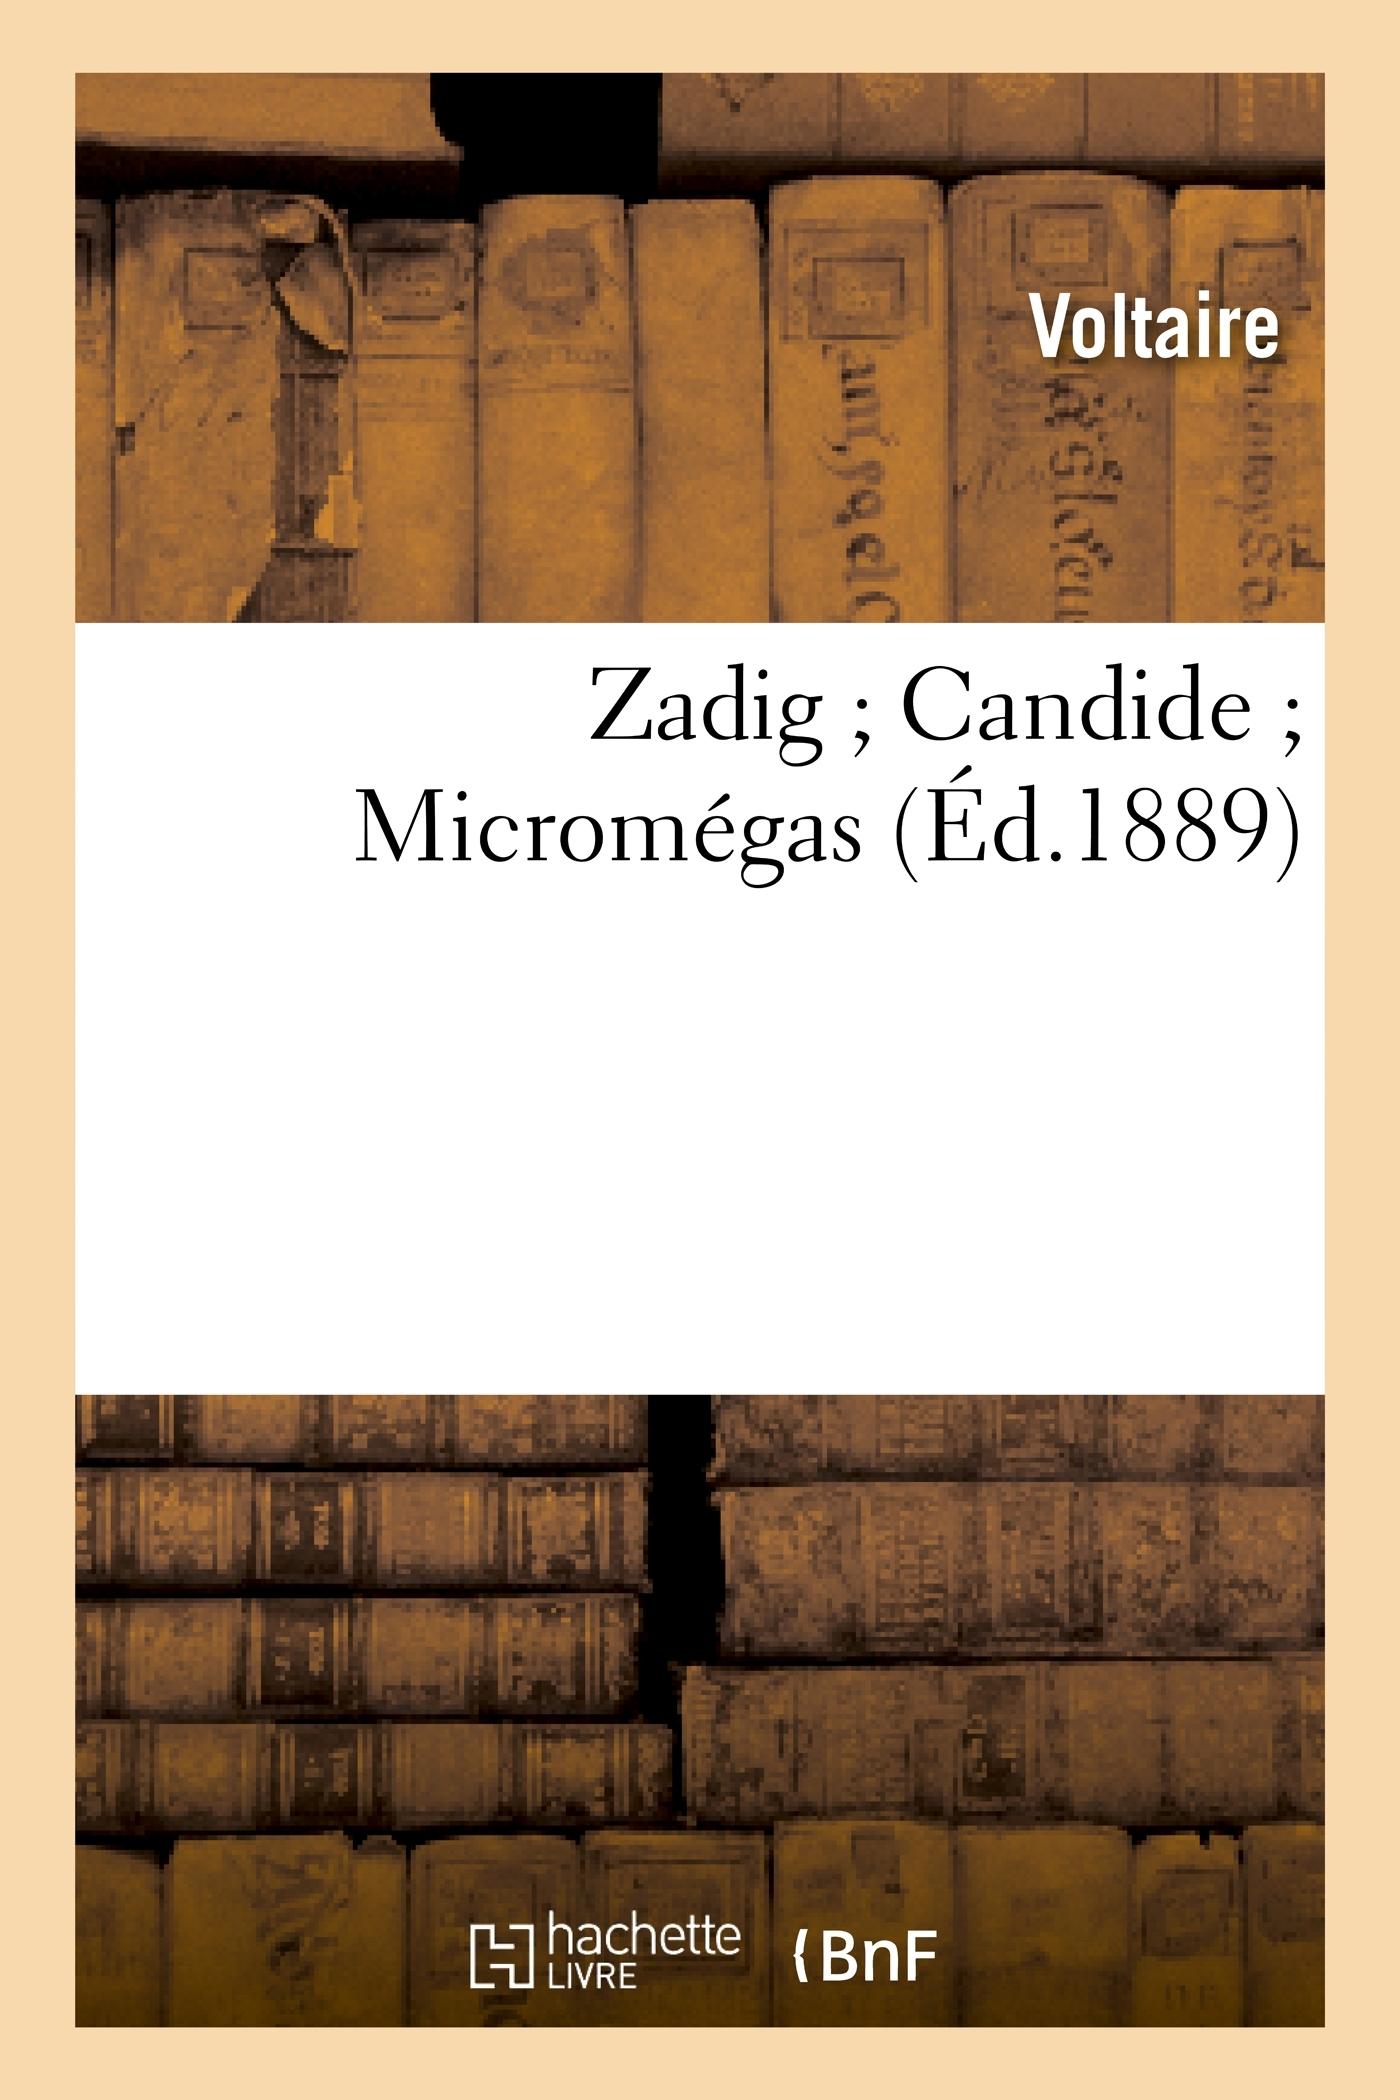 ZADIG CANDIDE MICROMEGAS